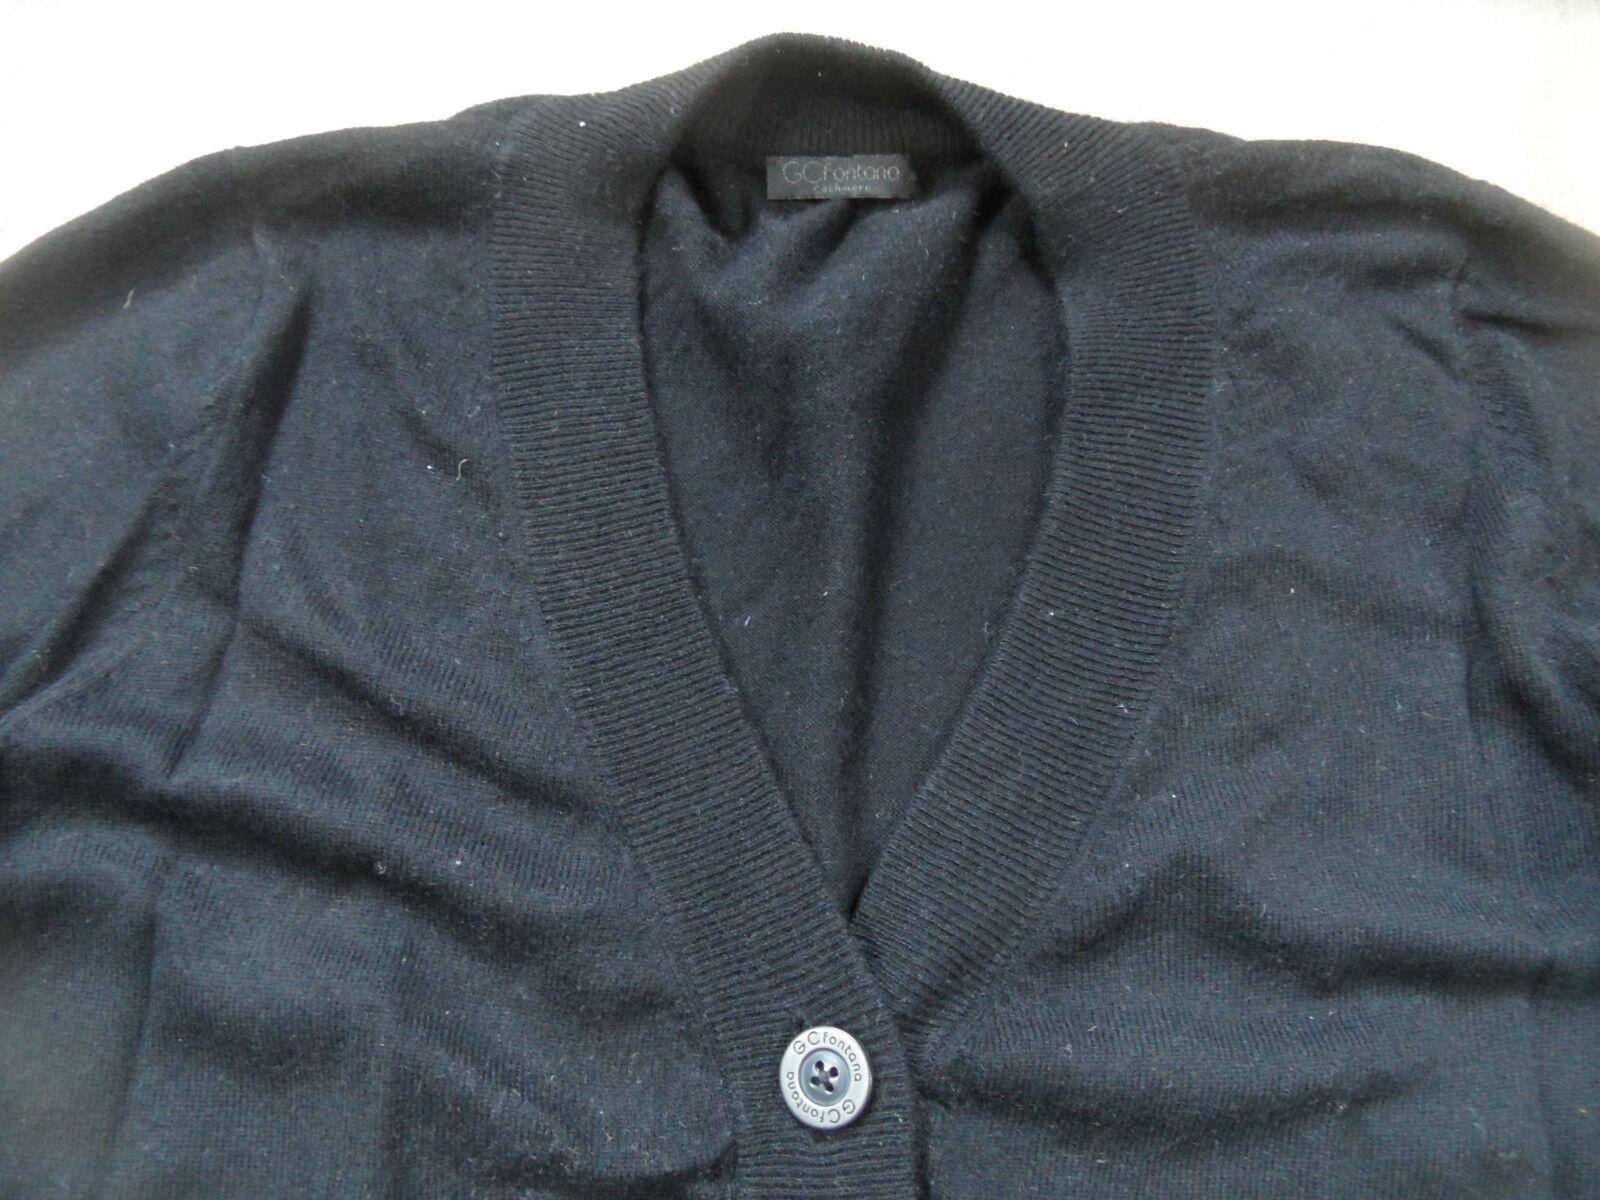 GC Fontana bel bel bel Pullover con Bottoni M. Cashmere Nero Mis. 38 Top bi418 02e4d6